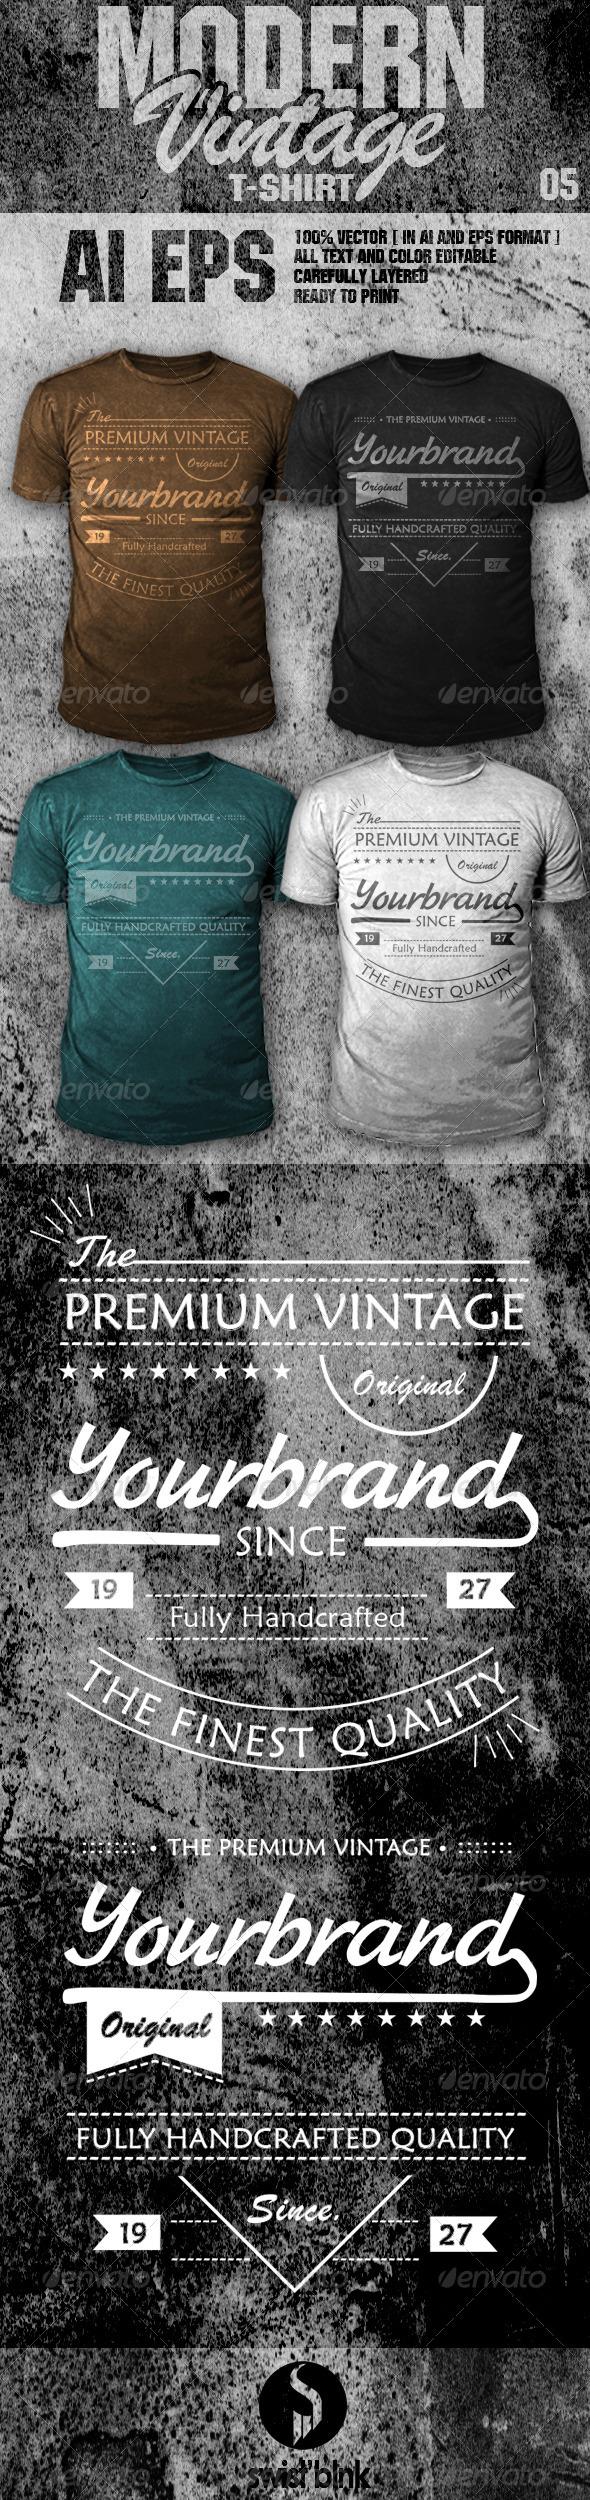 Modern Vintage T-Shirt 05 - Designs T-Shirts